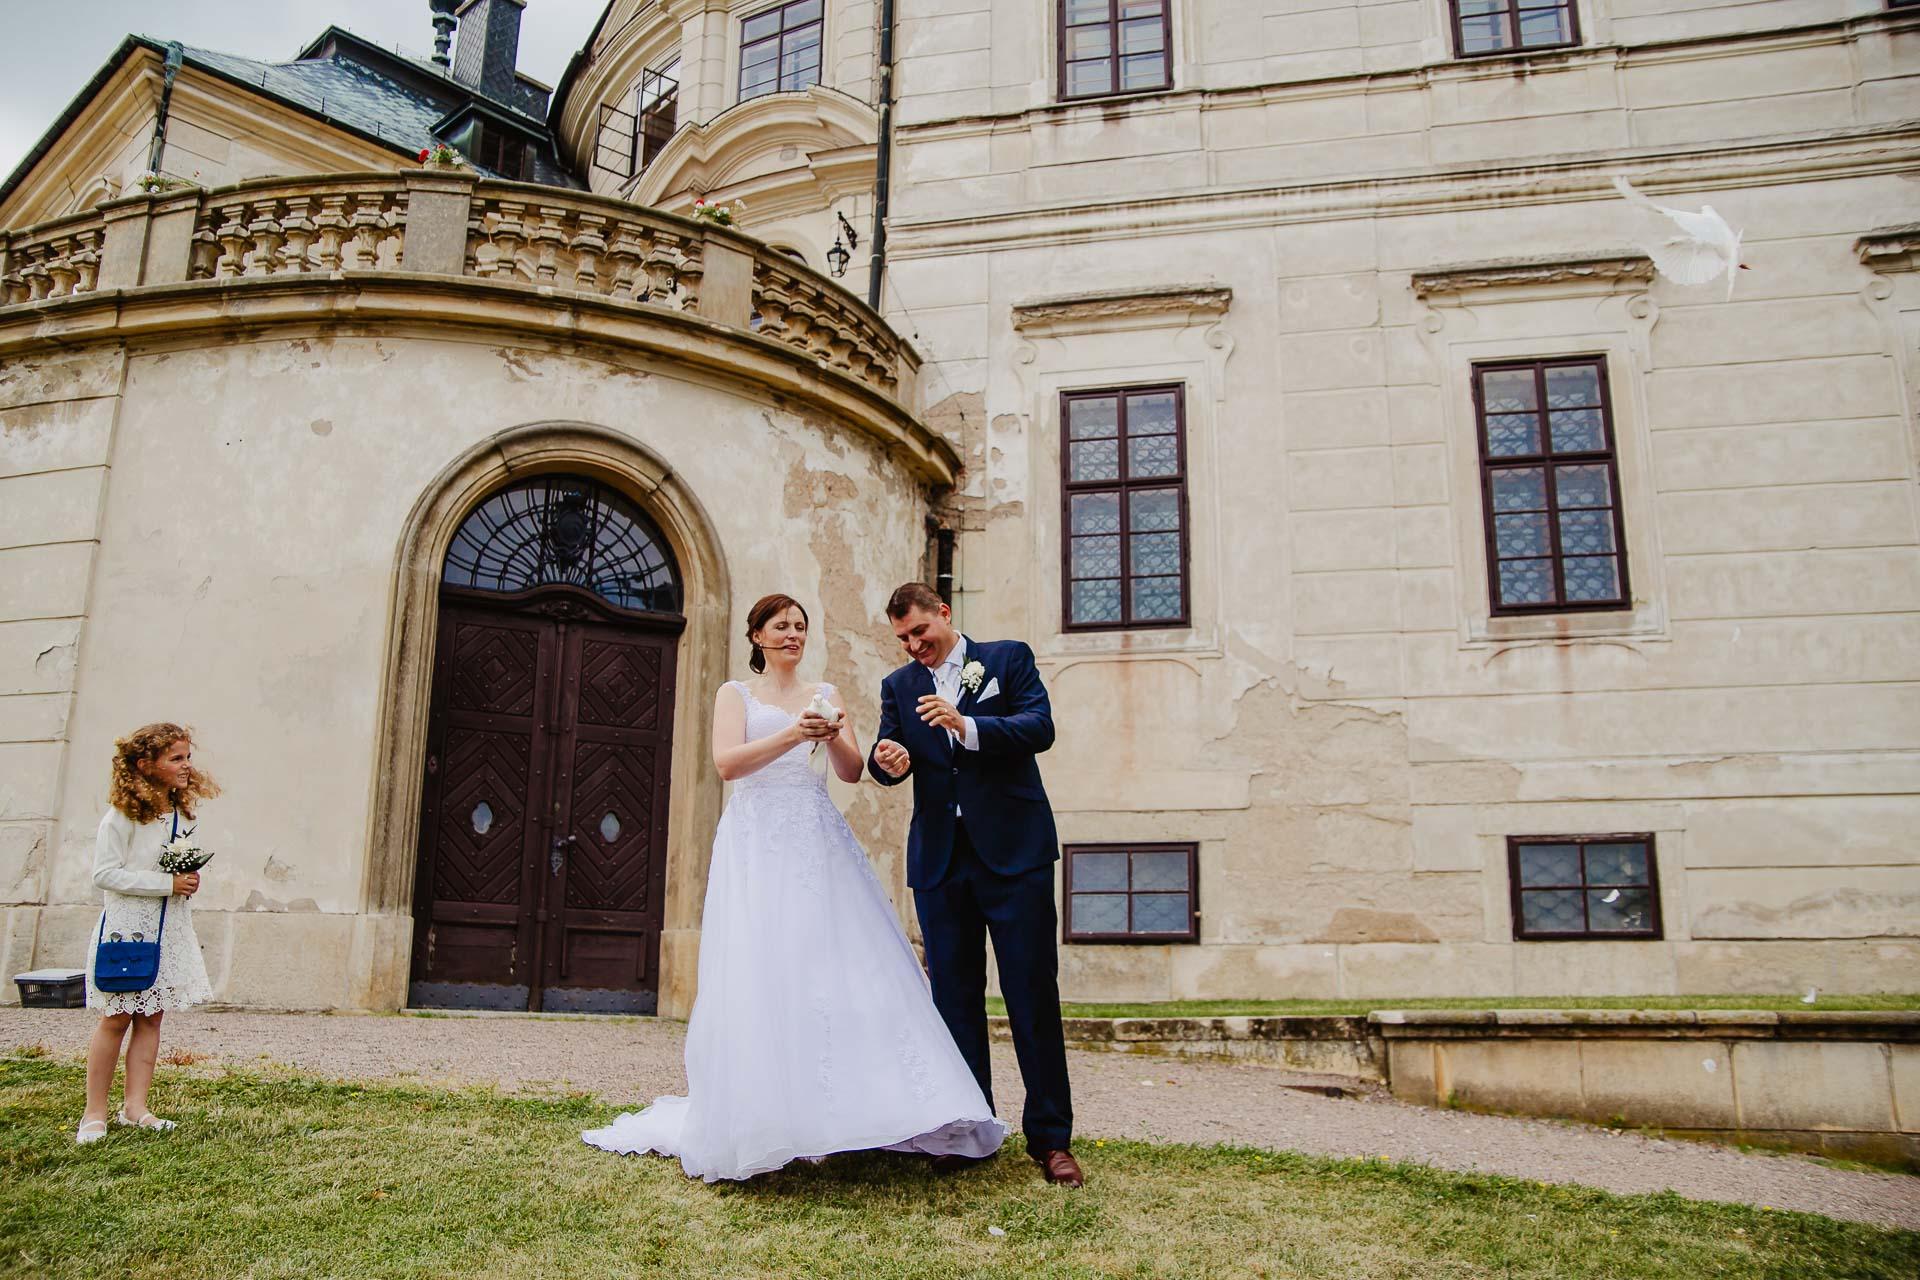 Svatební-fotograf-zámek-Karlova-Koruna-Chlumec-nad-Cidlinou-117